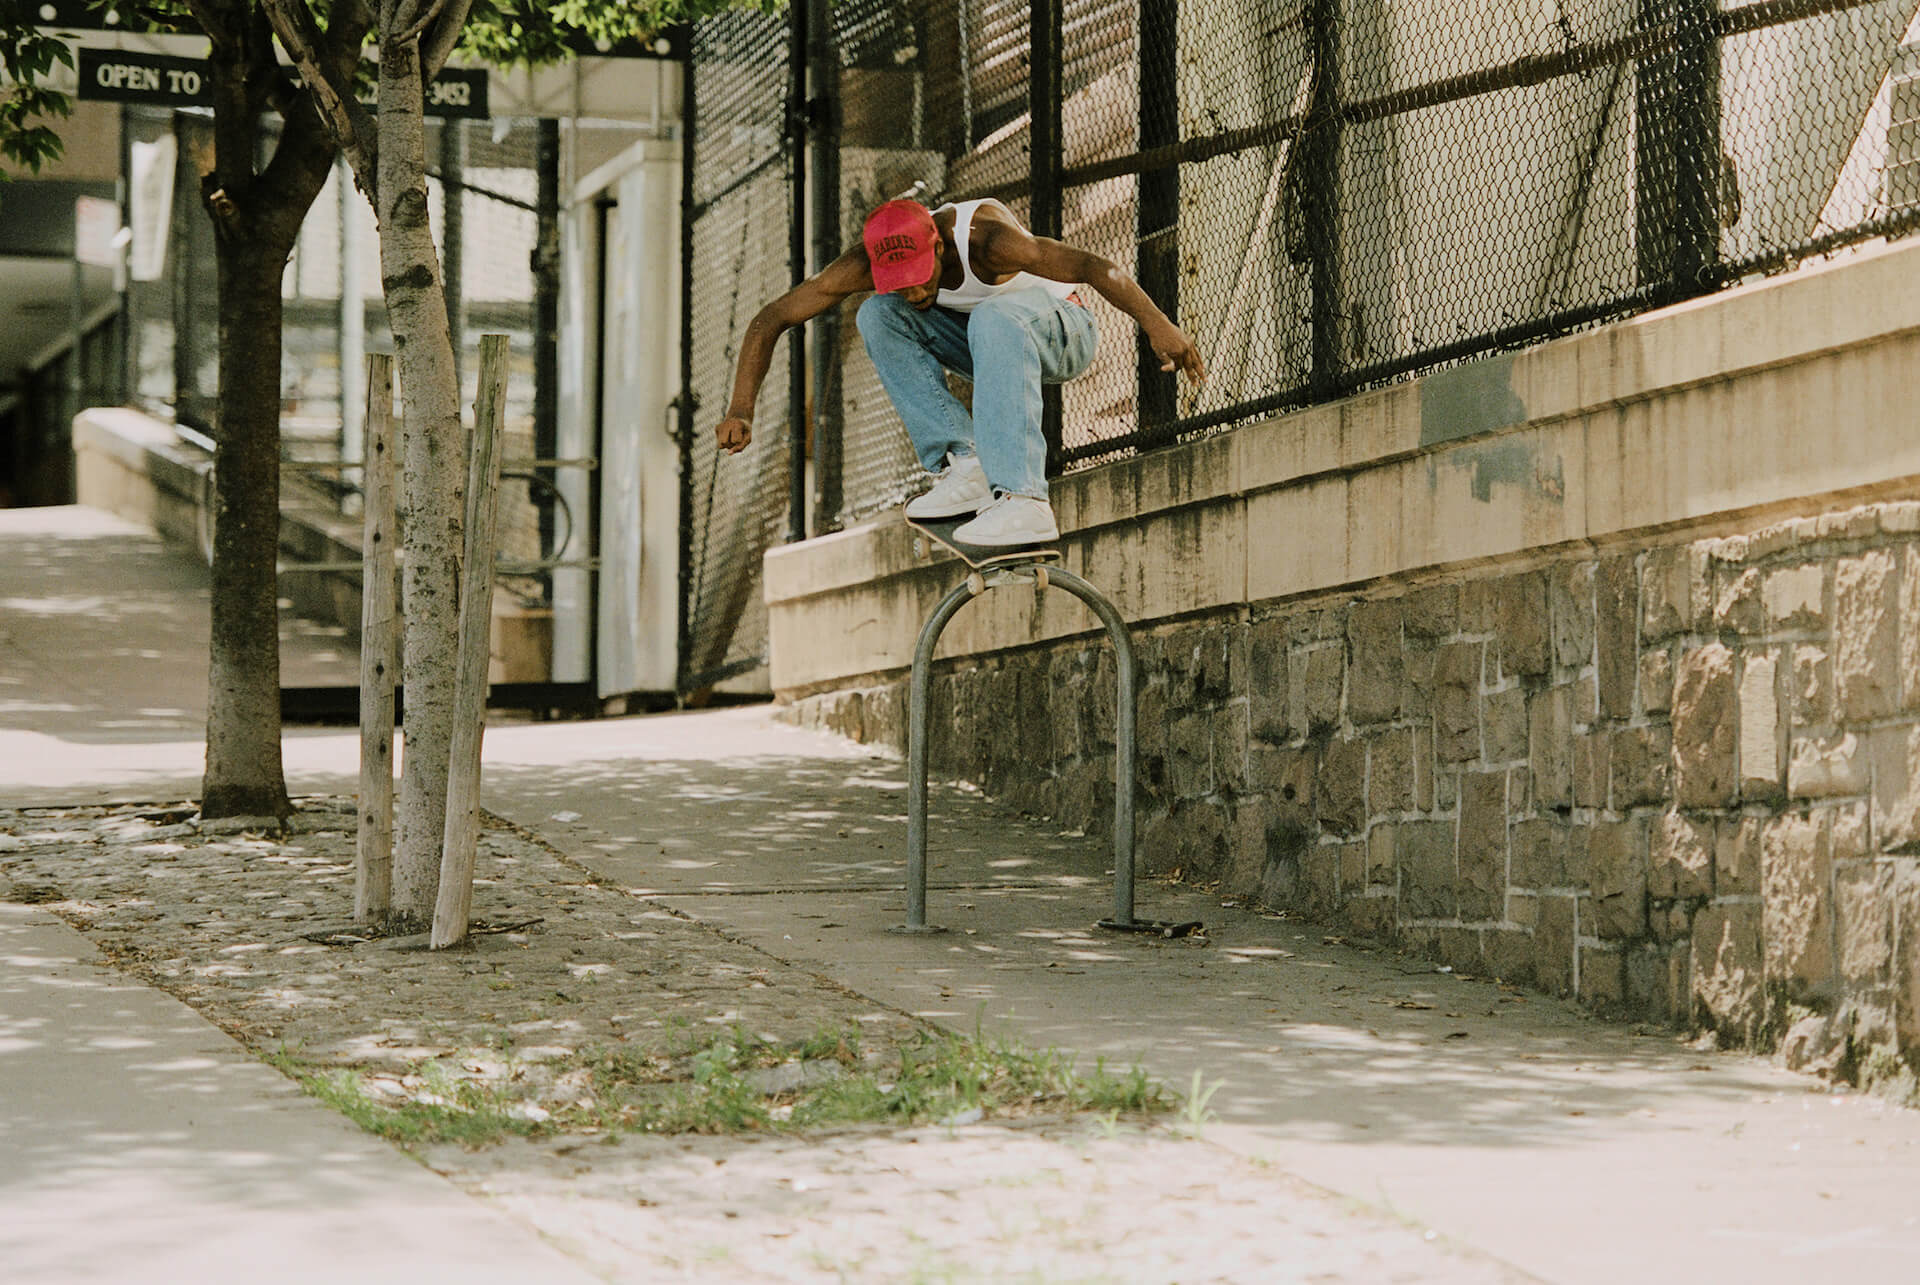 adidas SkateboardingとTHRASHERがコラボ!プロスケーターTyshawn Jonesのシグネチャーモデル&新型SUPERSTARが登場 life201126_adidas_skateboarding_6